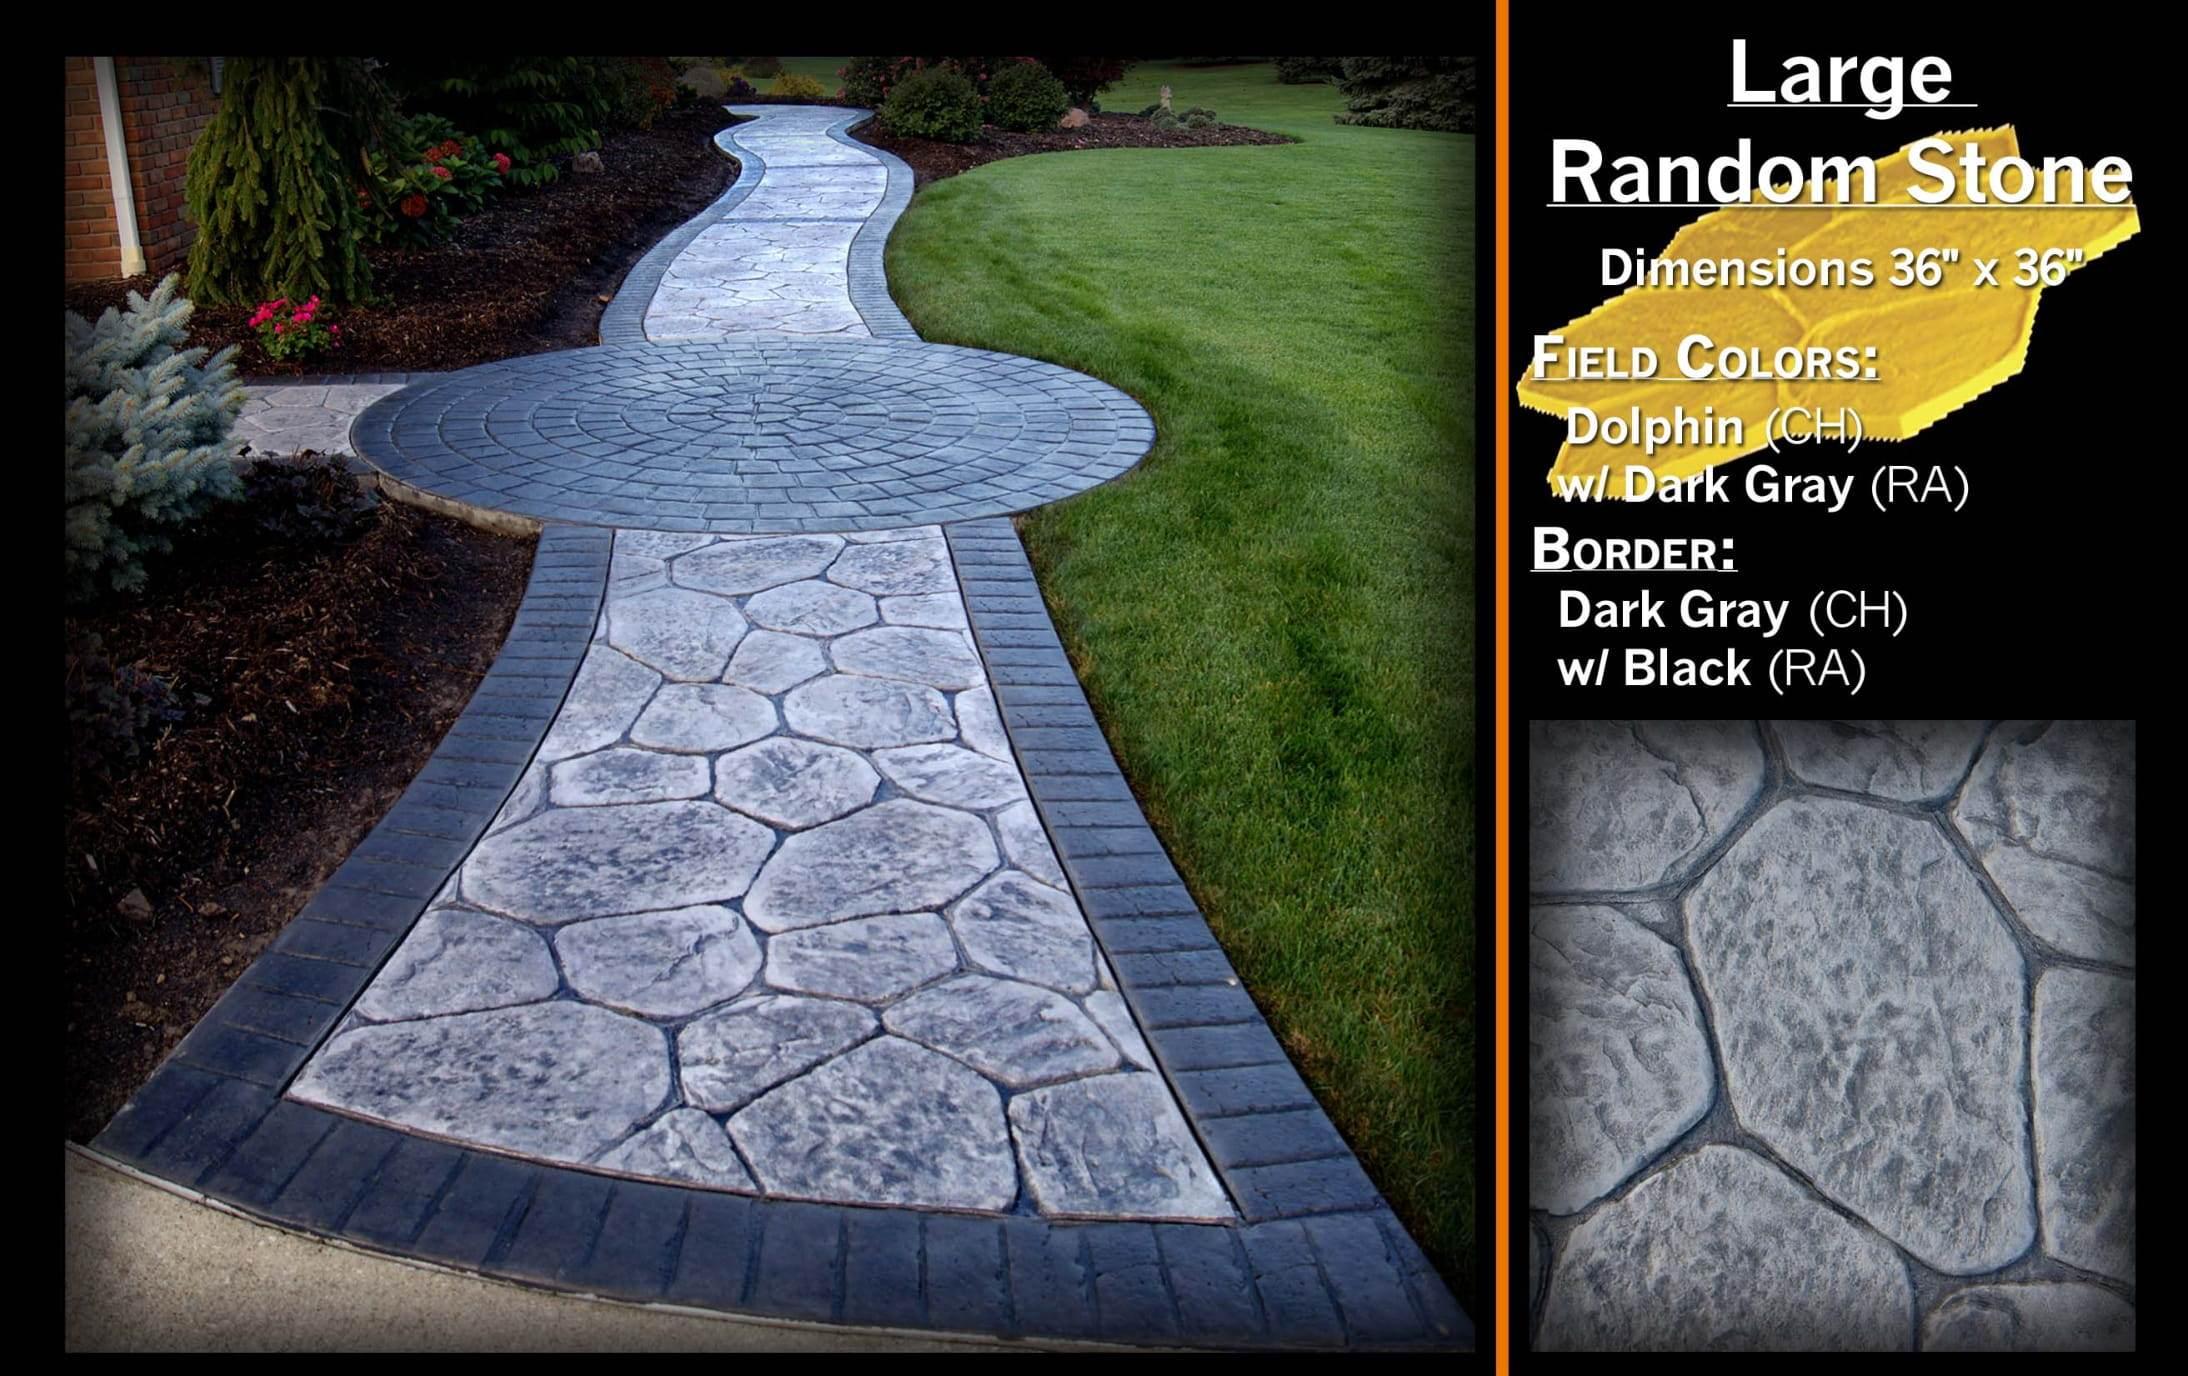 Large Random Stone